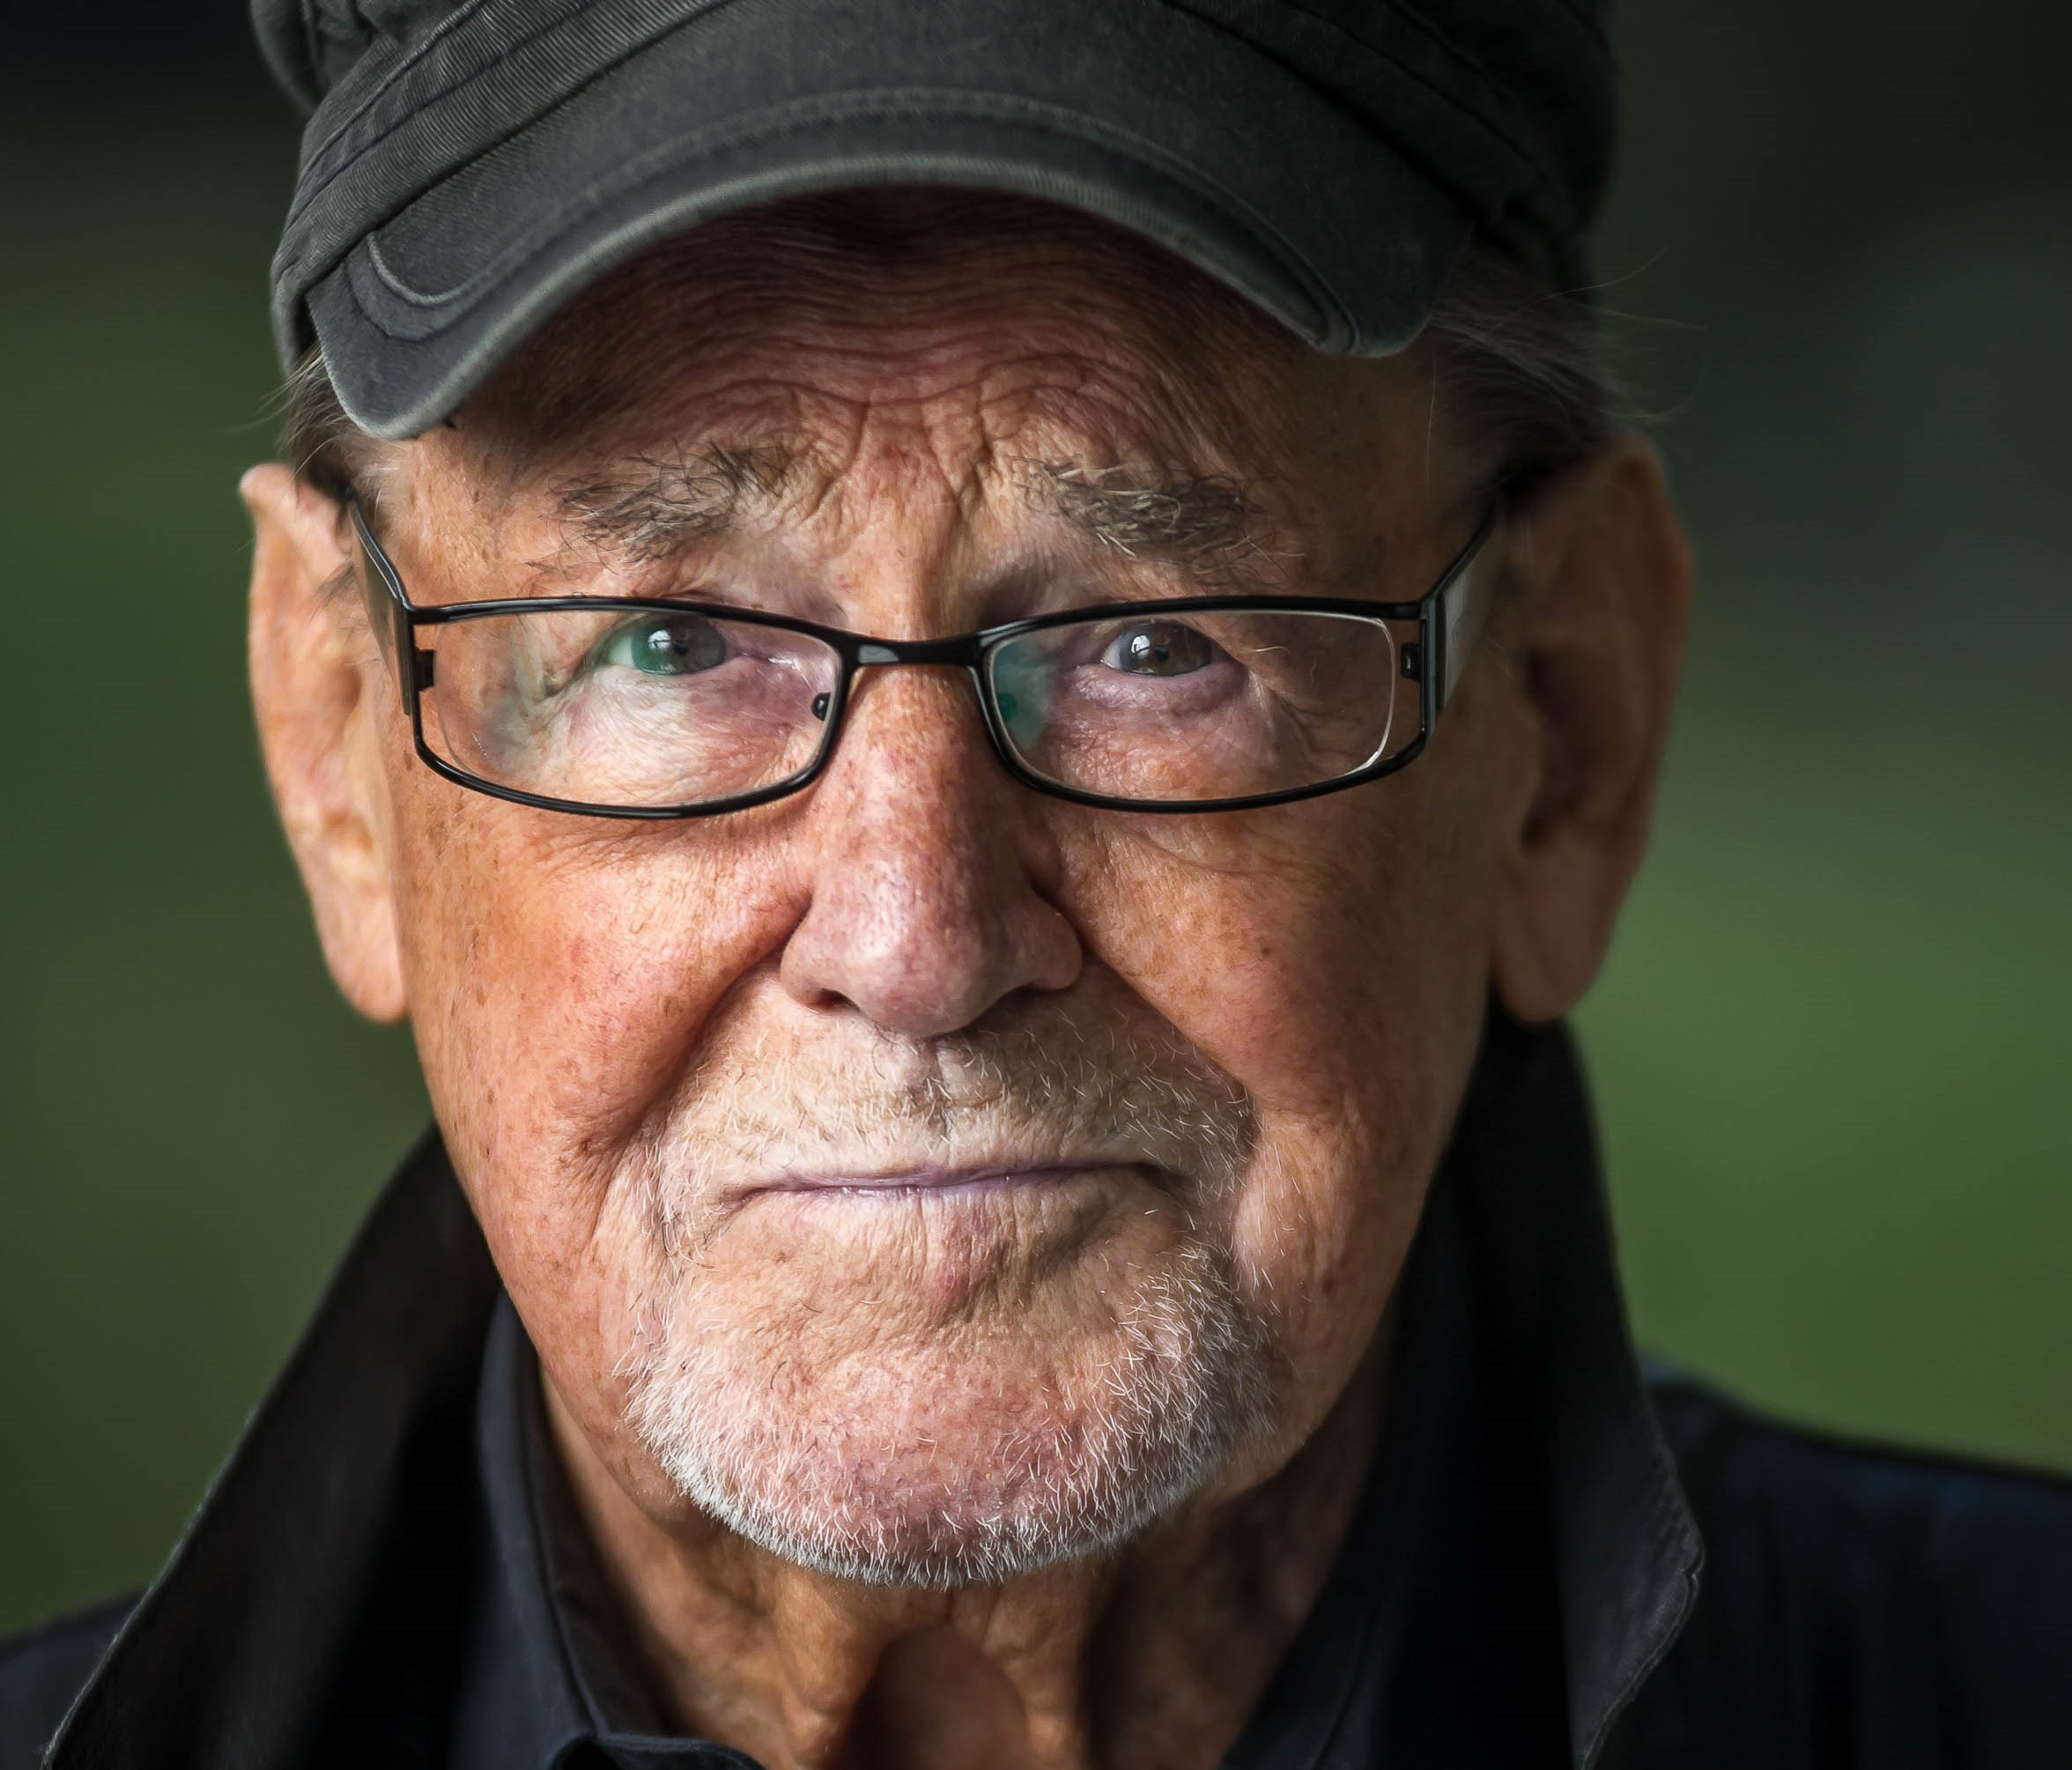 Herbert Köfer Lungenkrebs